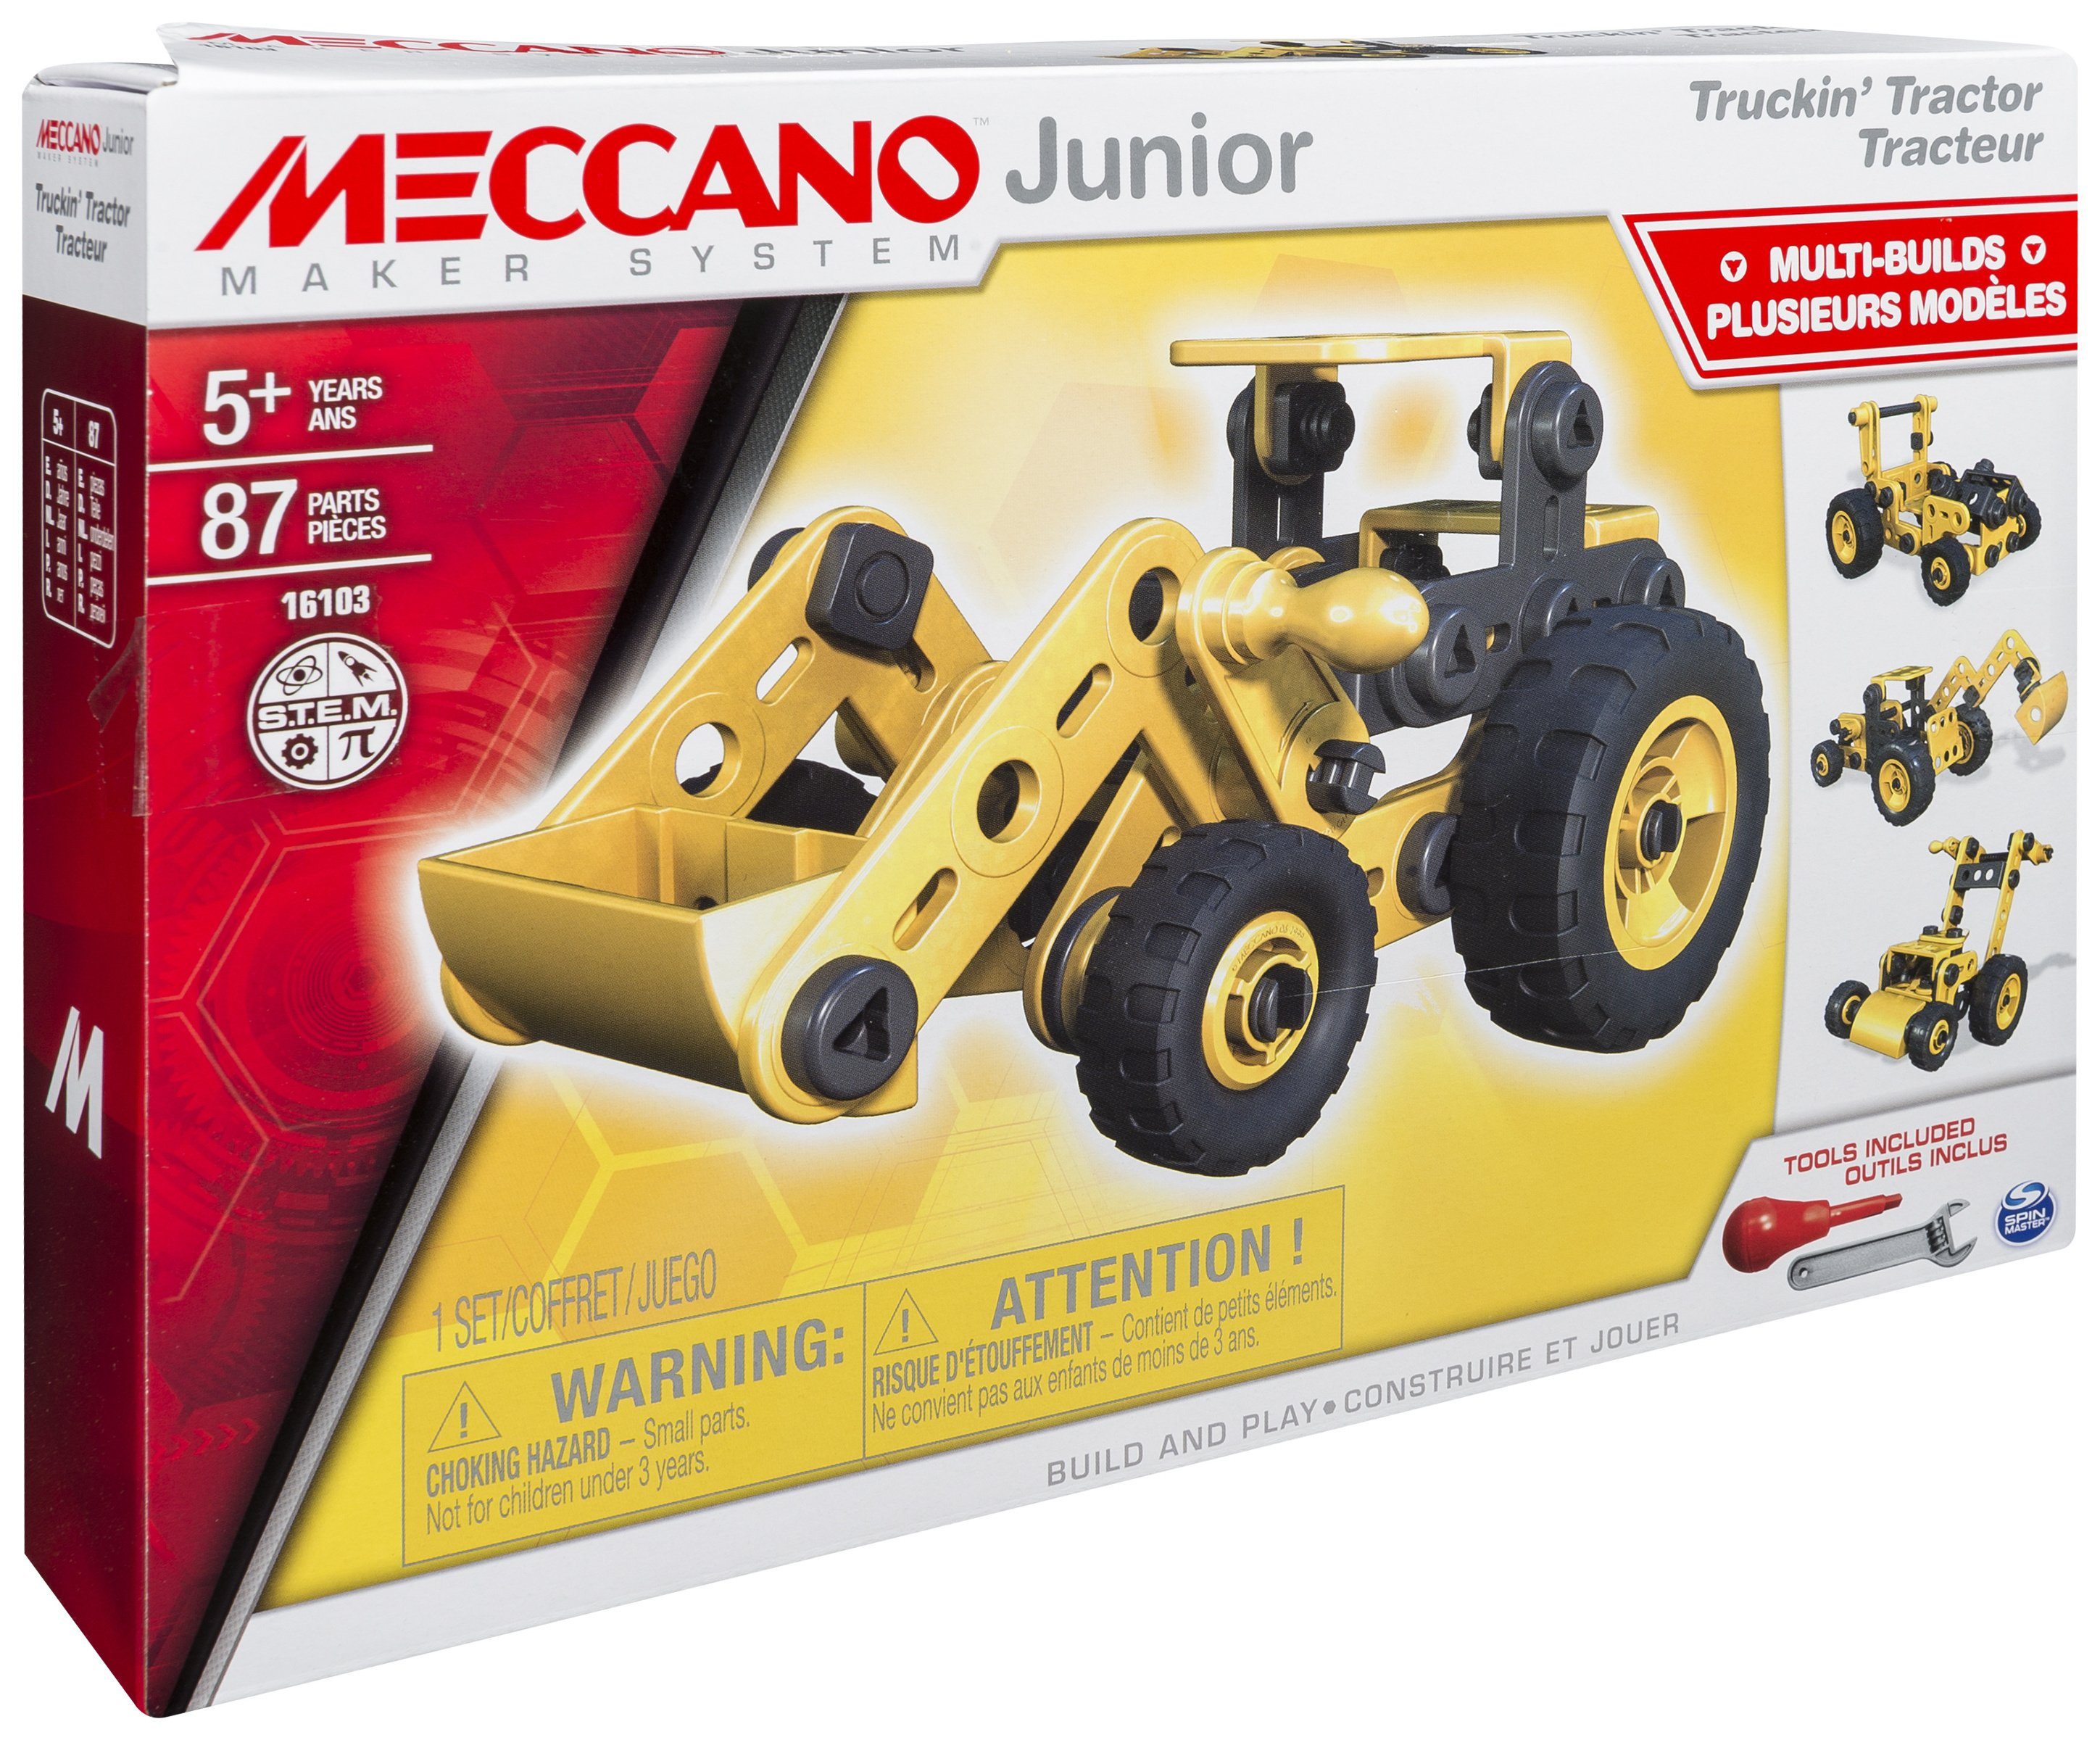 meccano junior truckin